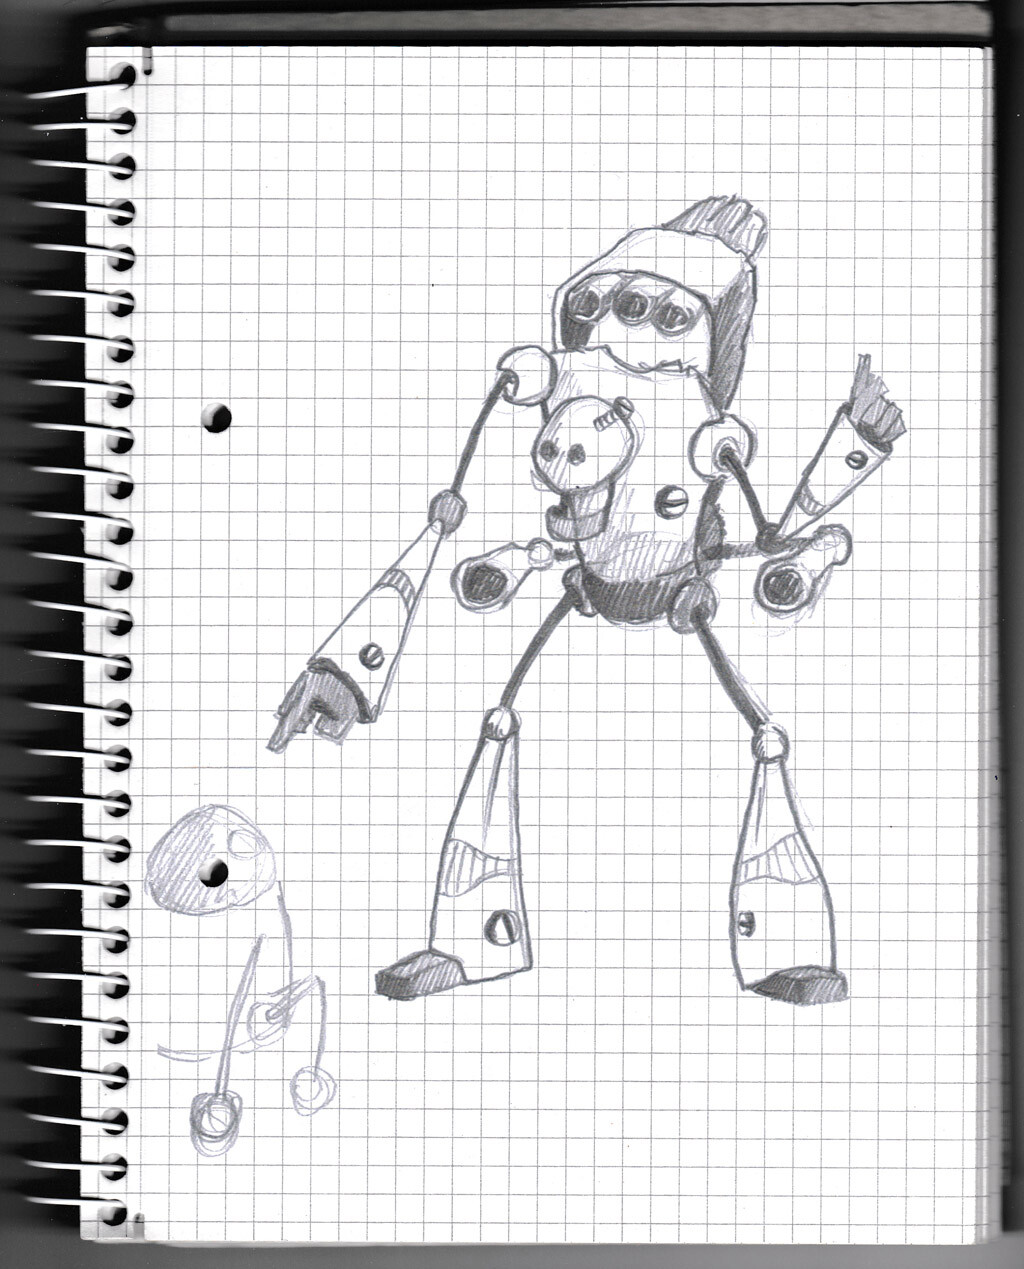 character, sketch, pencil, monster, creature, robot, concept,